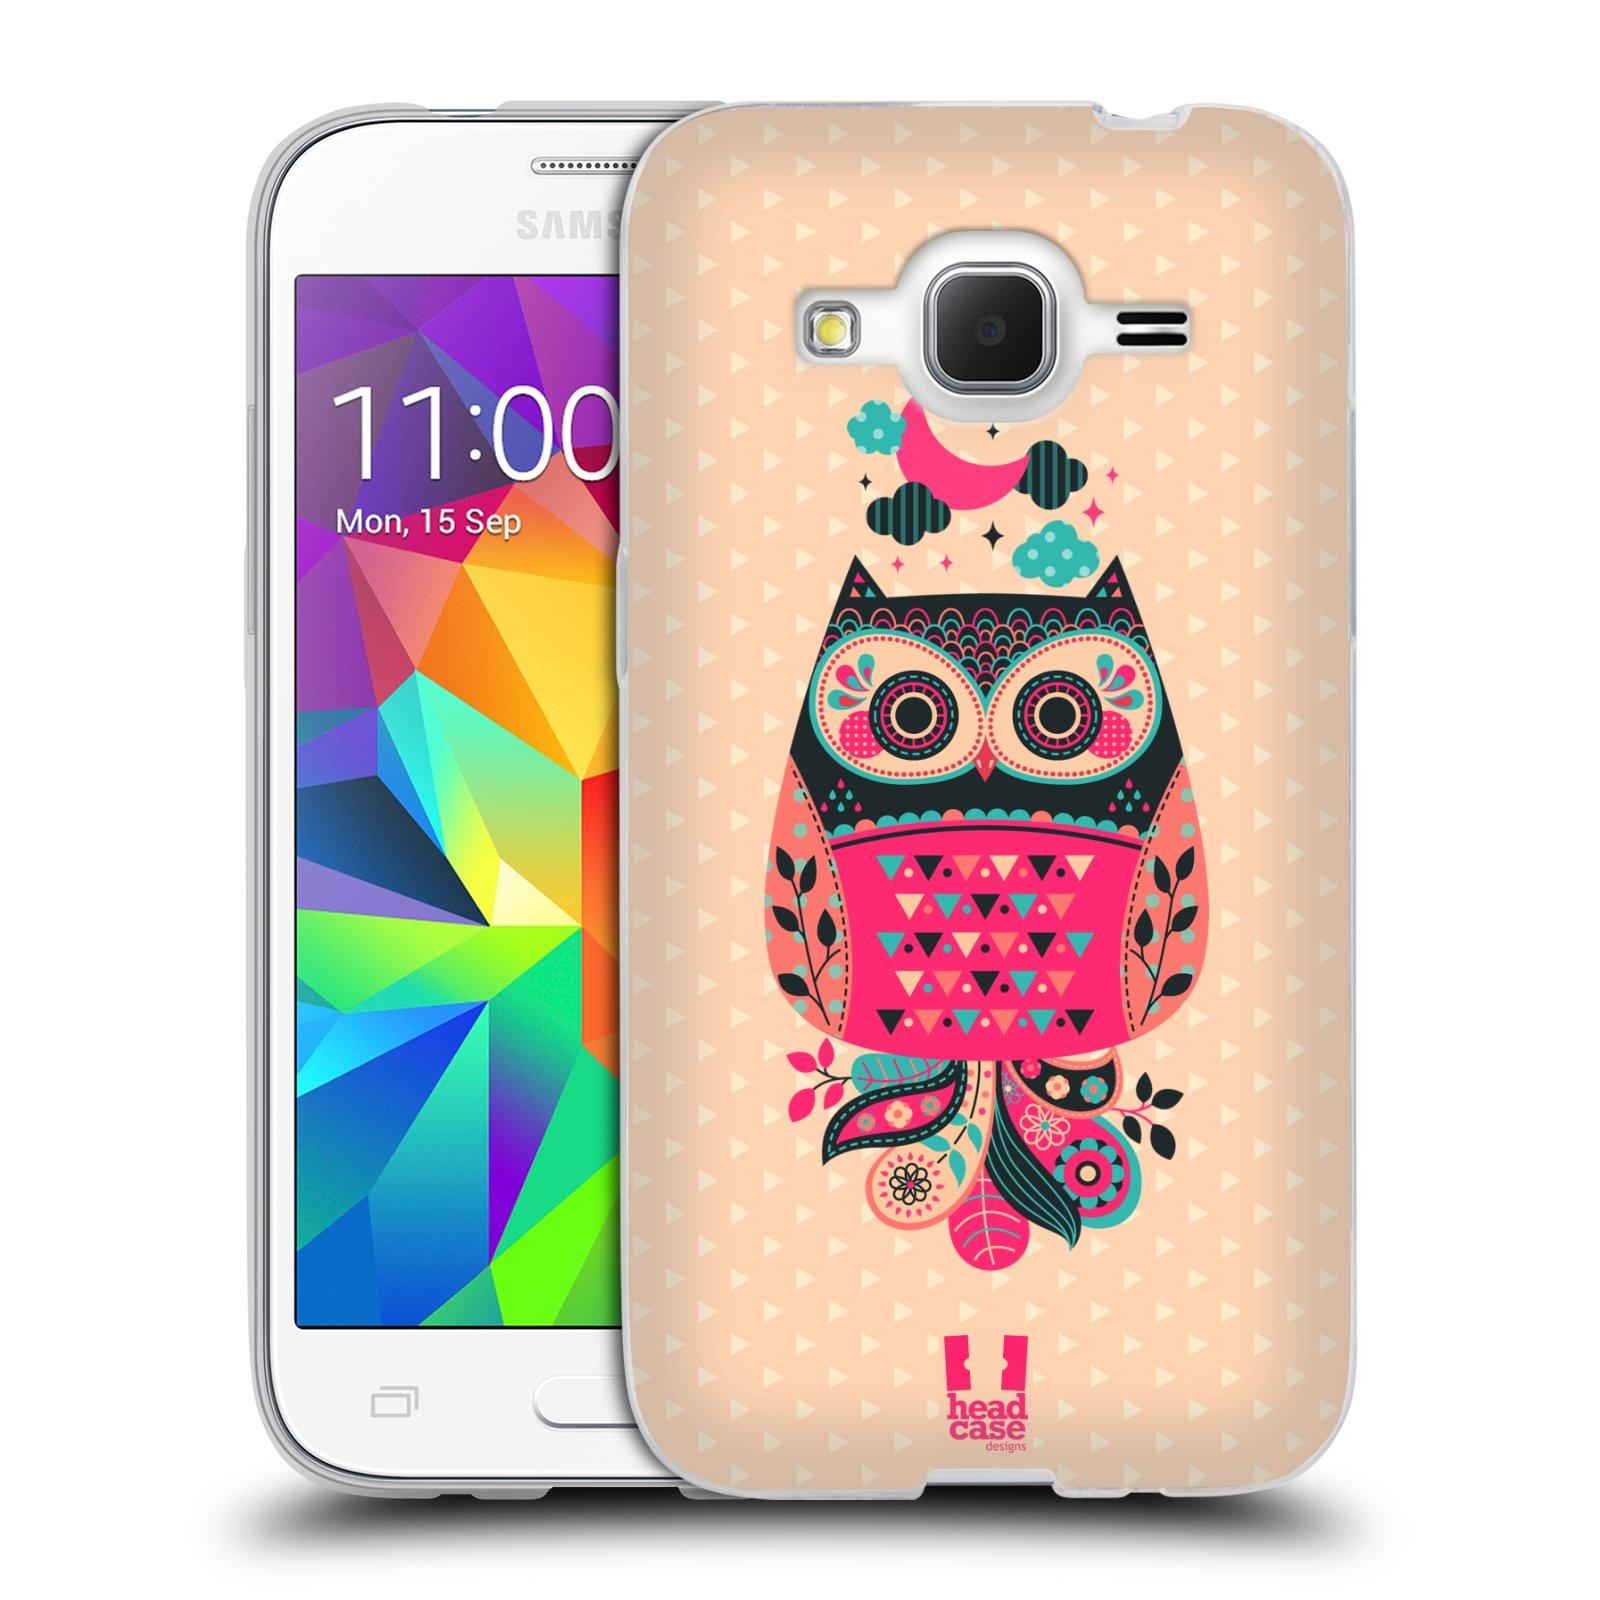 HEAD CASE silikonový obal na mobil Samsung Galaxy Core Prime (G360) vzor Stmívání sovička černá a korálová